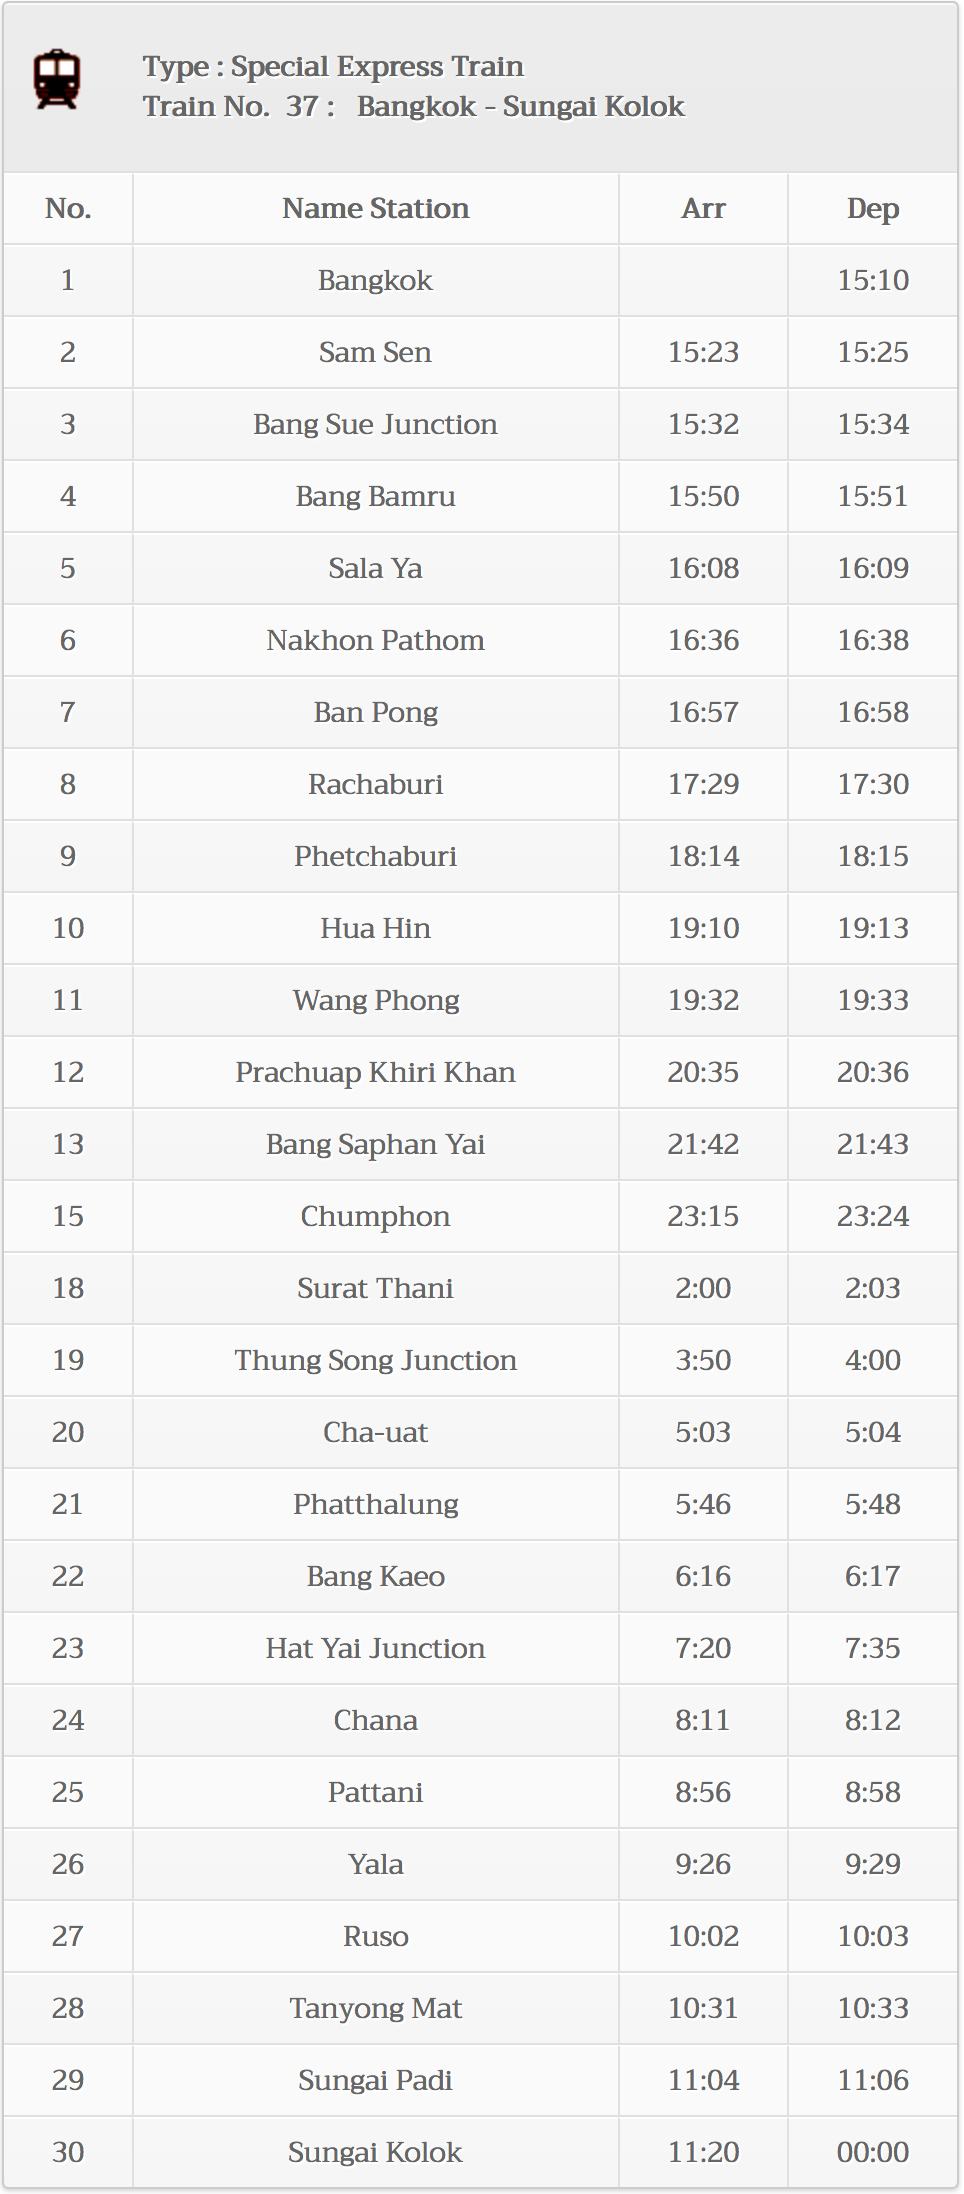 train-37-bangkok-to-sungai-kolok-timetable.png